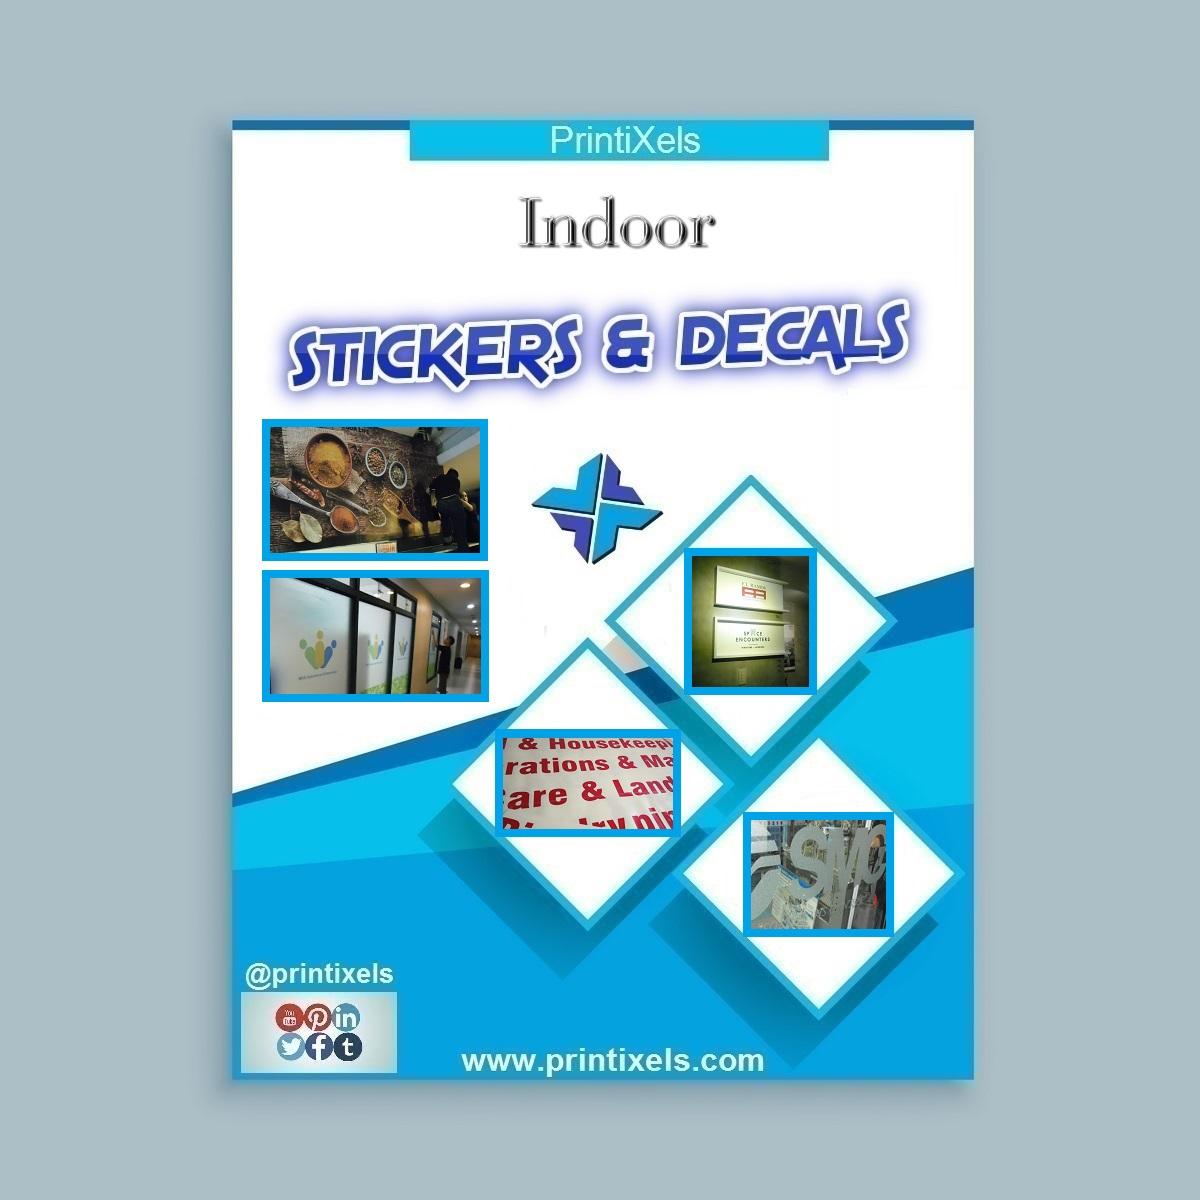 Customized Indoor Stickers & Decals